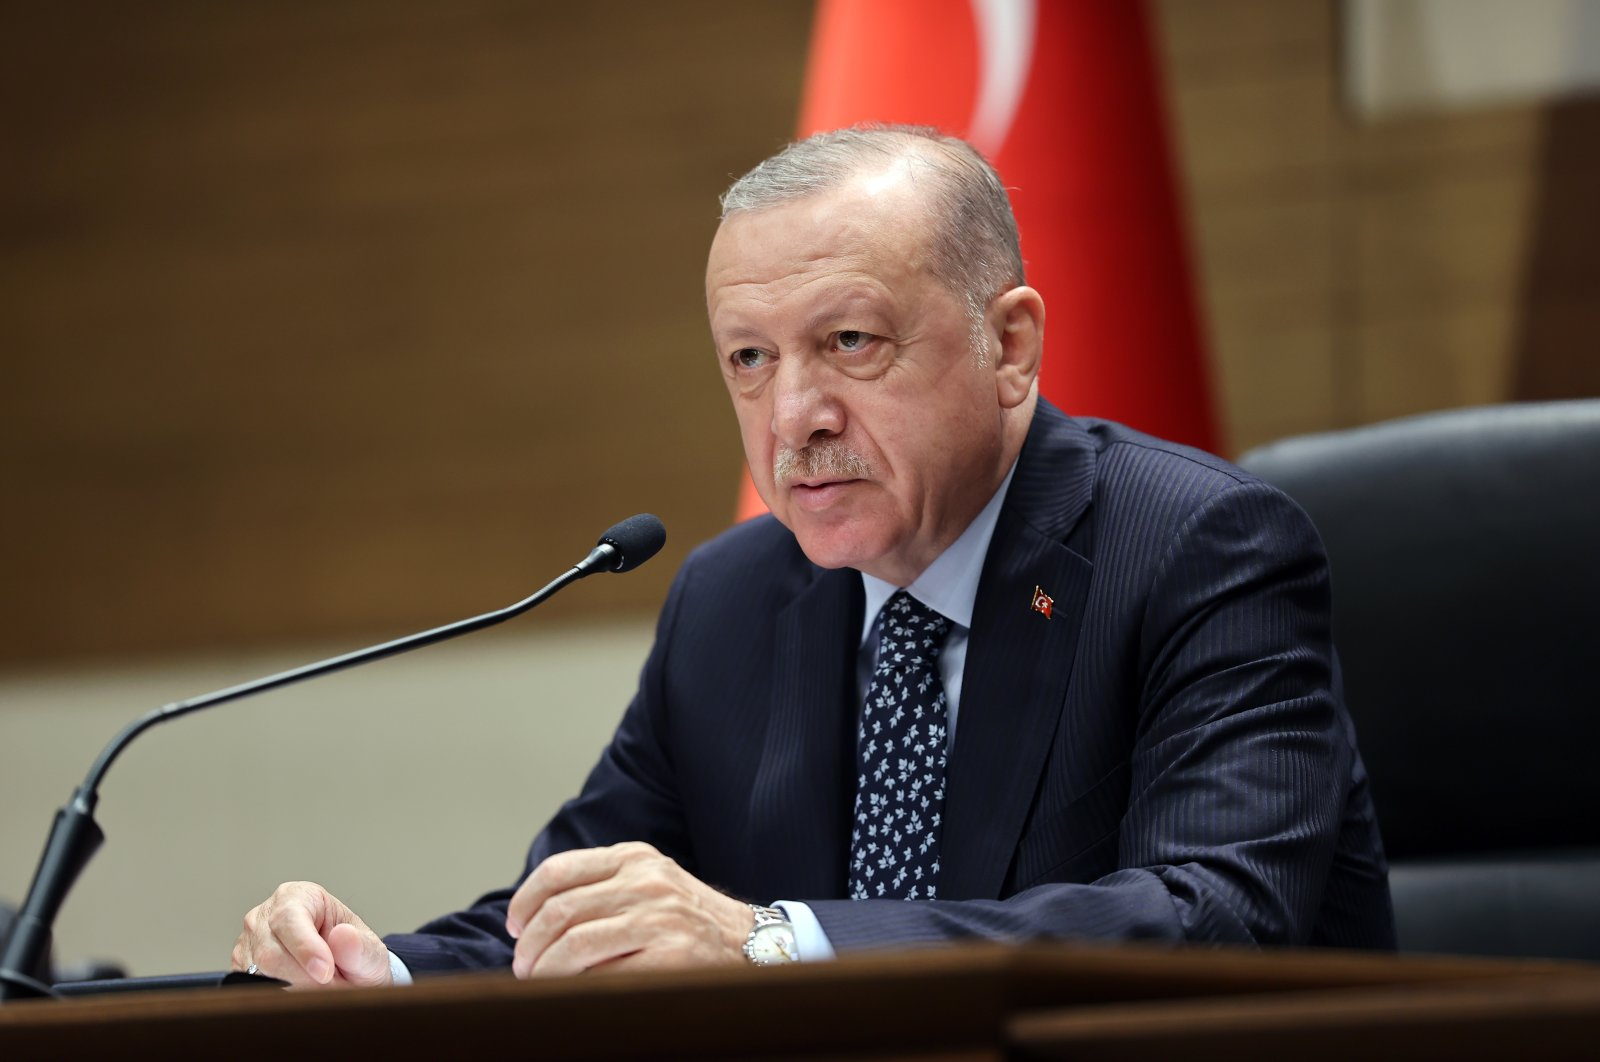 President Recep Tayyip Erdoğan speaking at Atatürk Airport in Istanbul, Turkey, Aug. 27, 2021 (AA Photo)